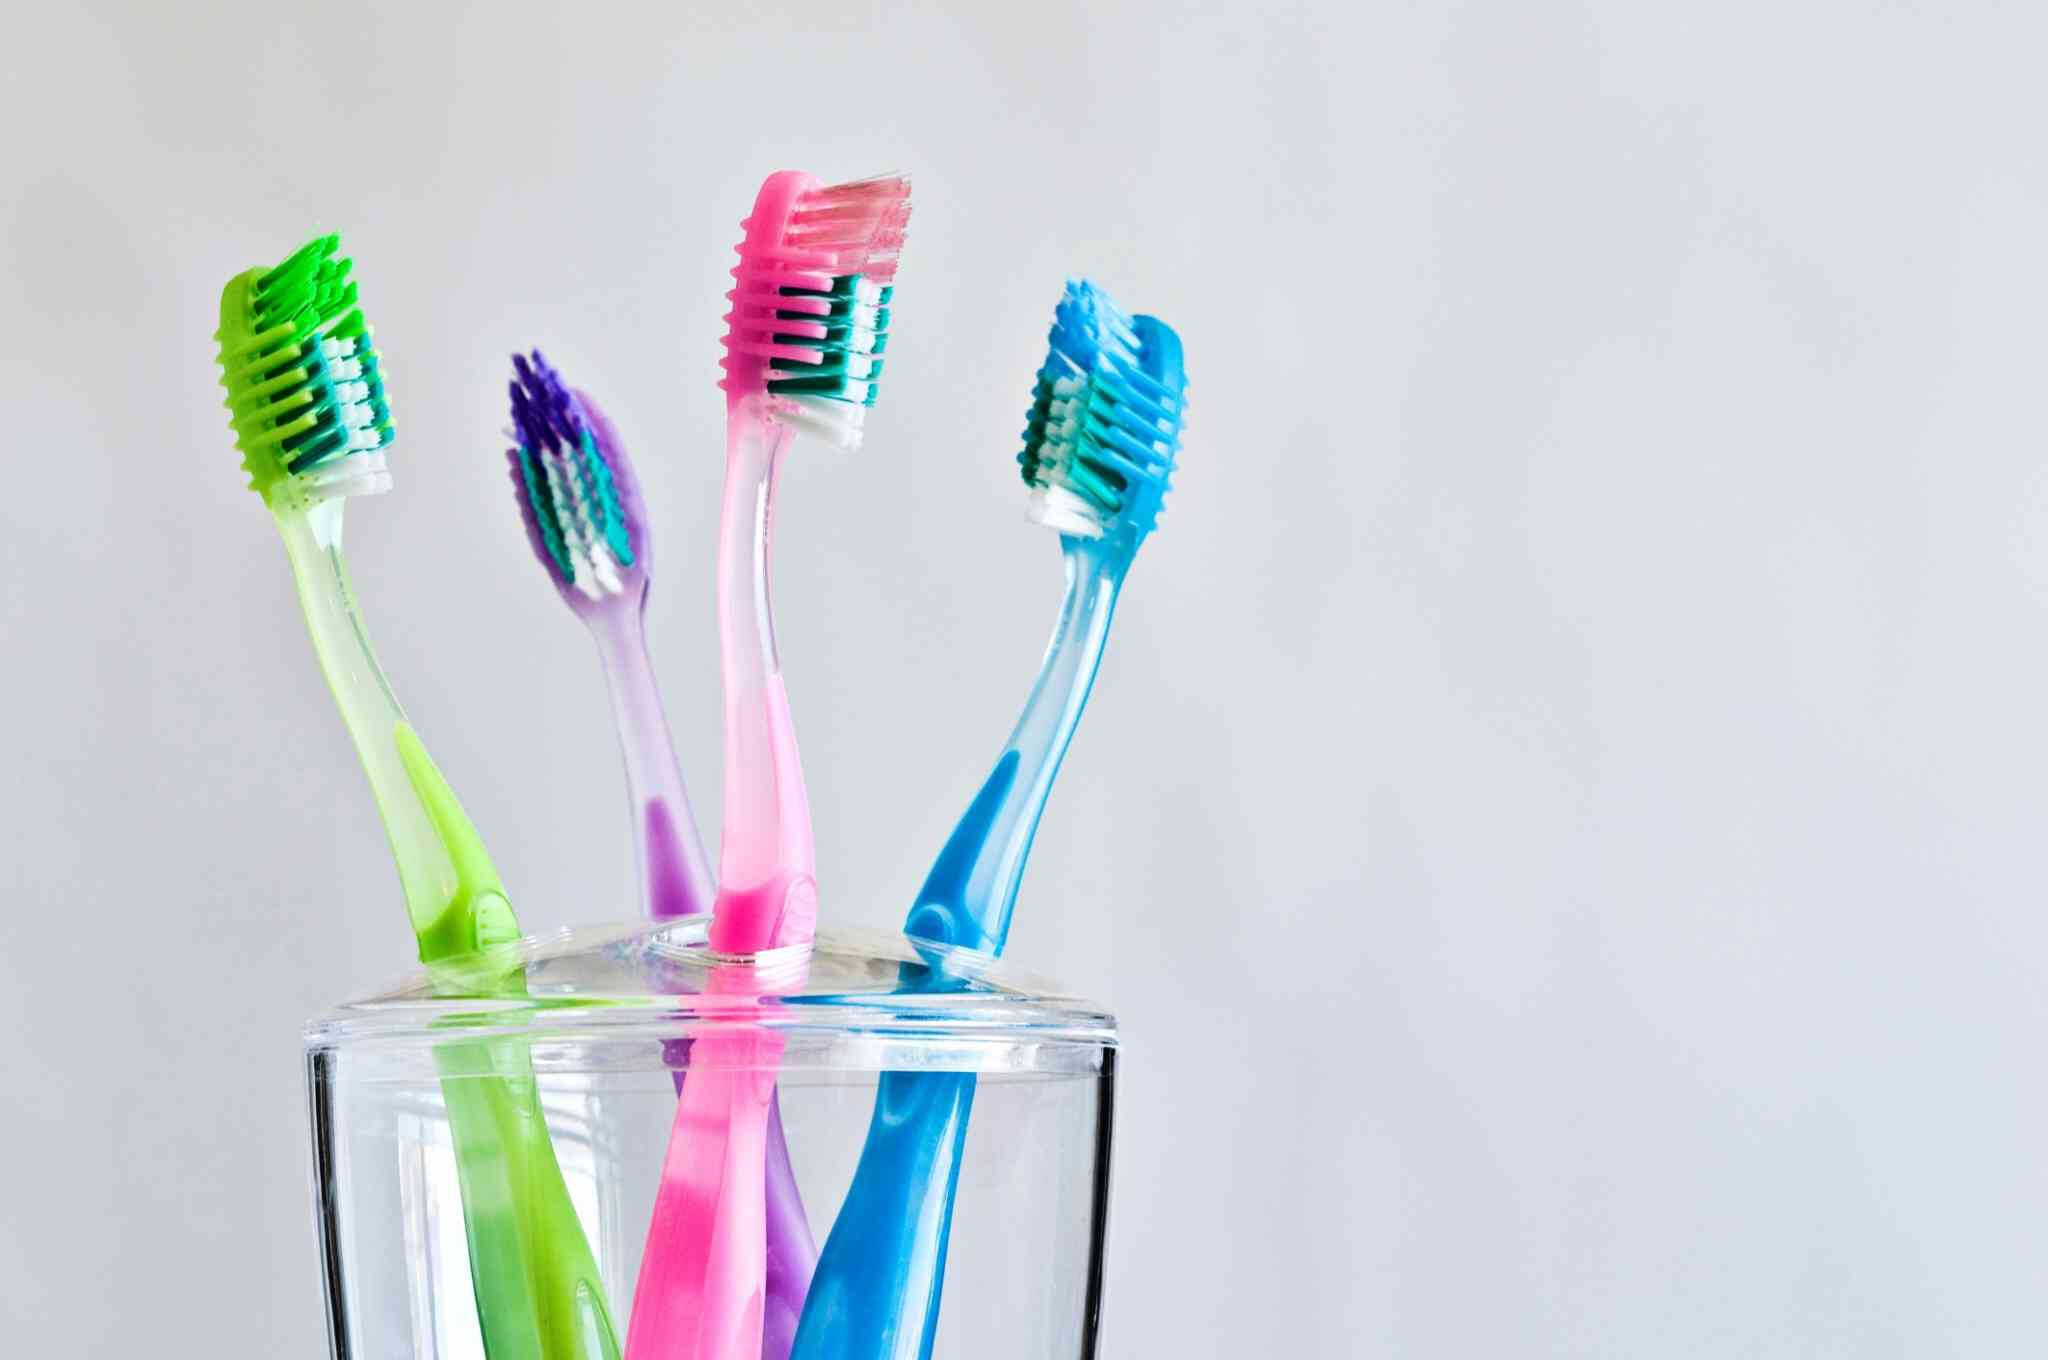 Sikat Gigi Rutin Tapi Tetap Bau Mulut? Kenali Masalahnya!